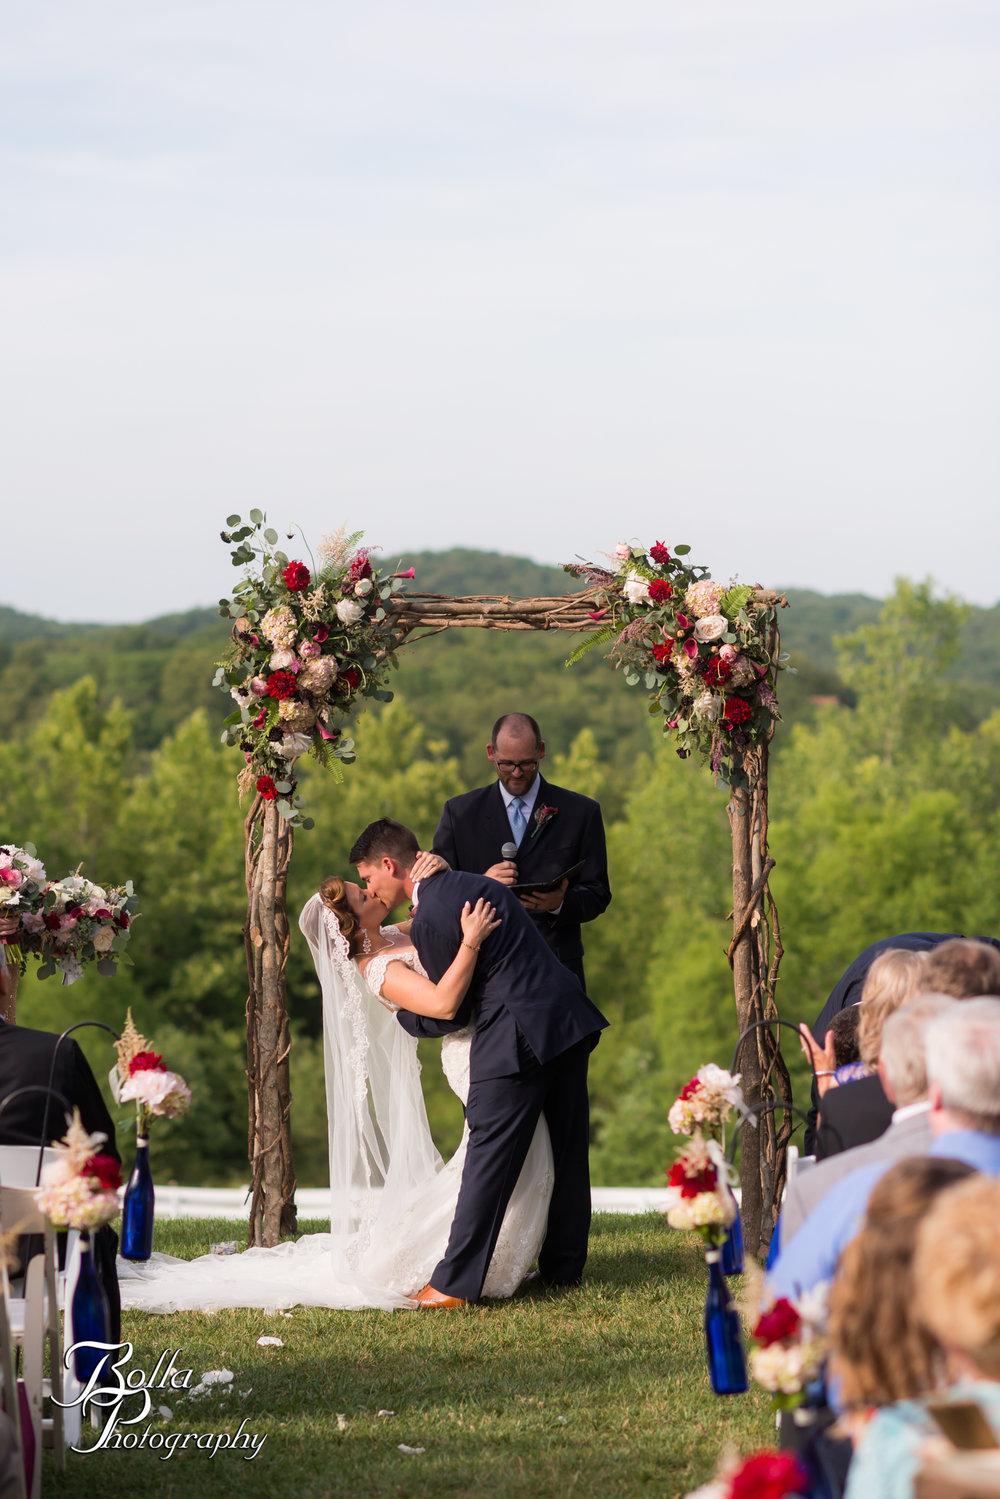 Bolla_photography_edwardsville_wedding_photographer_st_louis_weddings_Chaumette_winery_Mikusch-0415.jpg